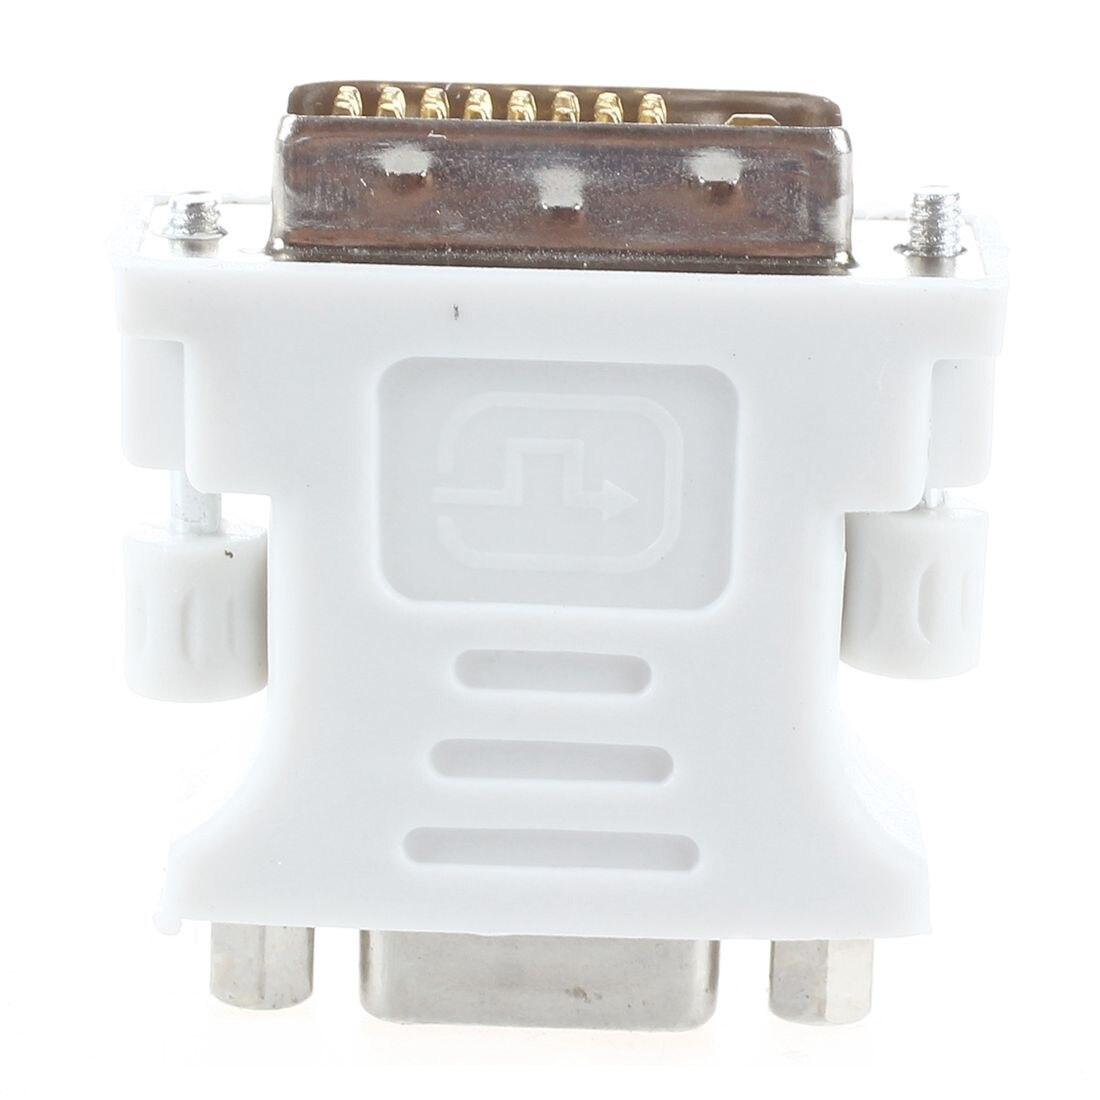 New DVI male adapter (DVI - D 24 1) to female VGA (15-pin) new dvi male adapter dvi d 24 1 to female vga 15 pin